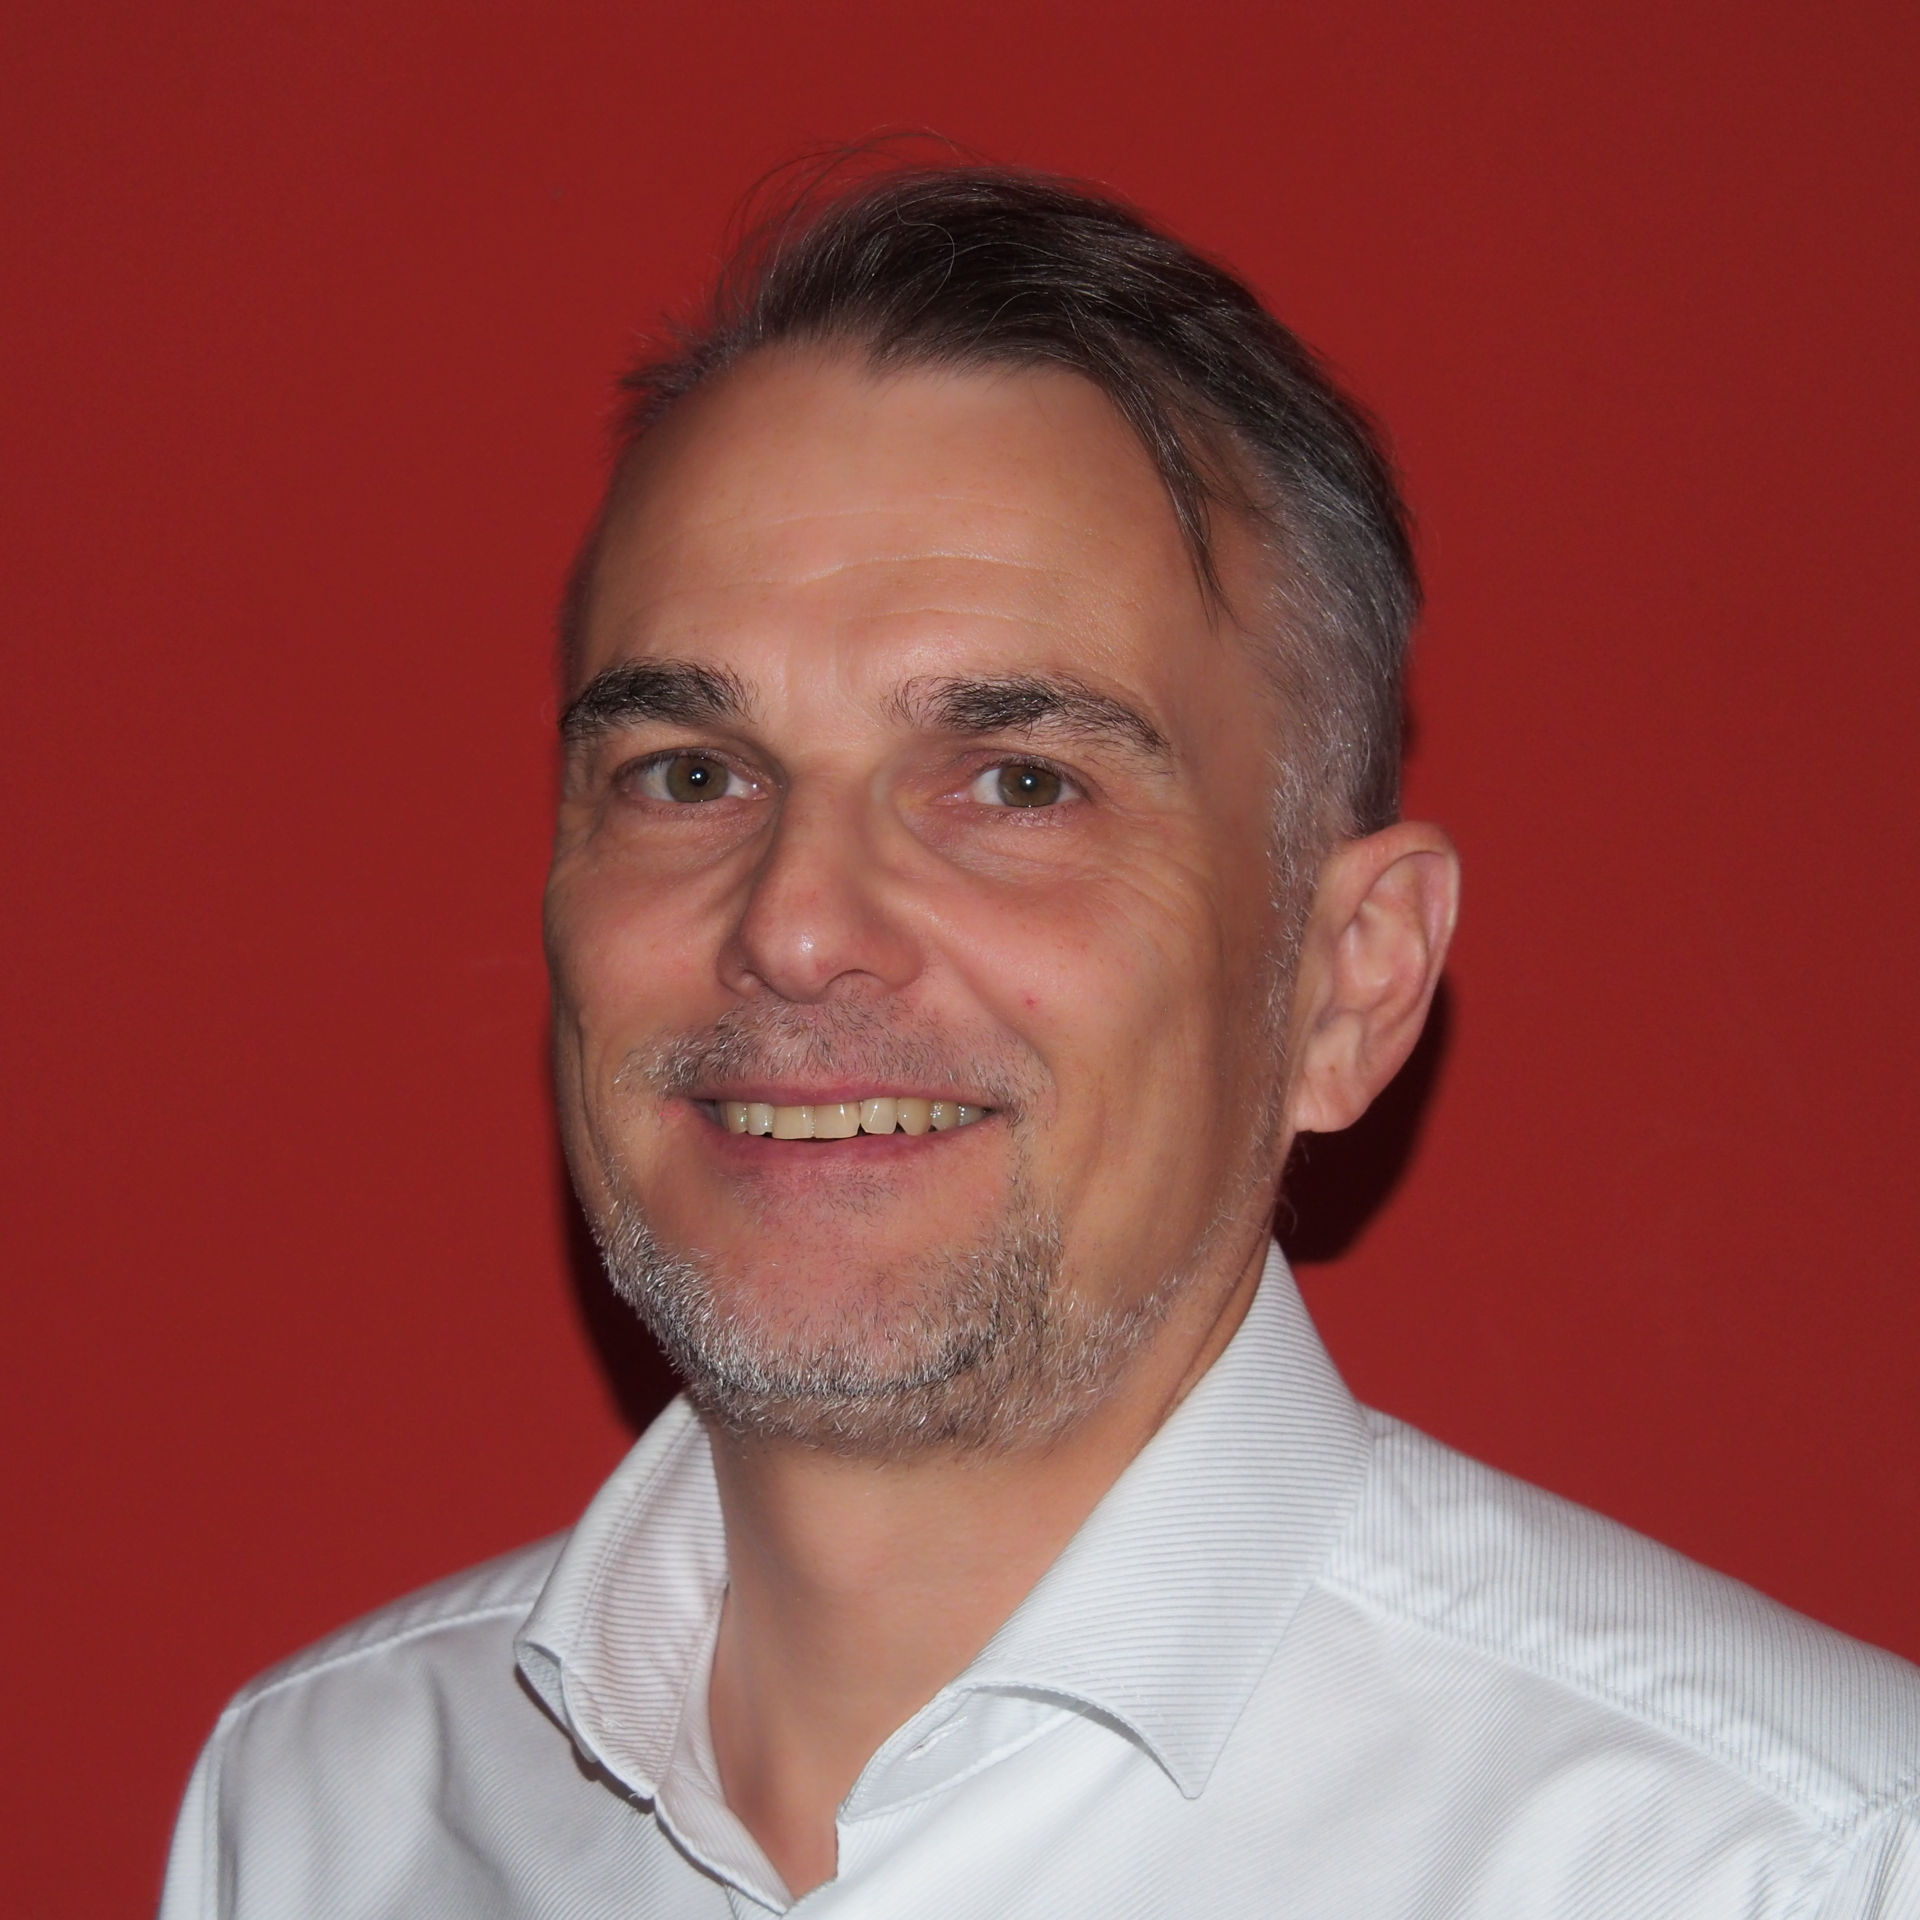 Claus Leitloff